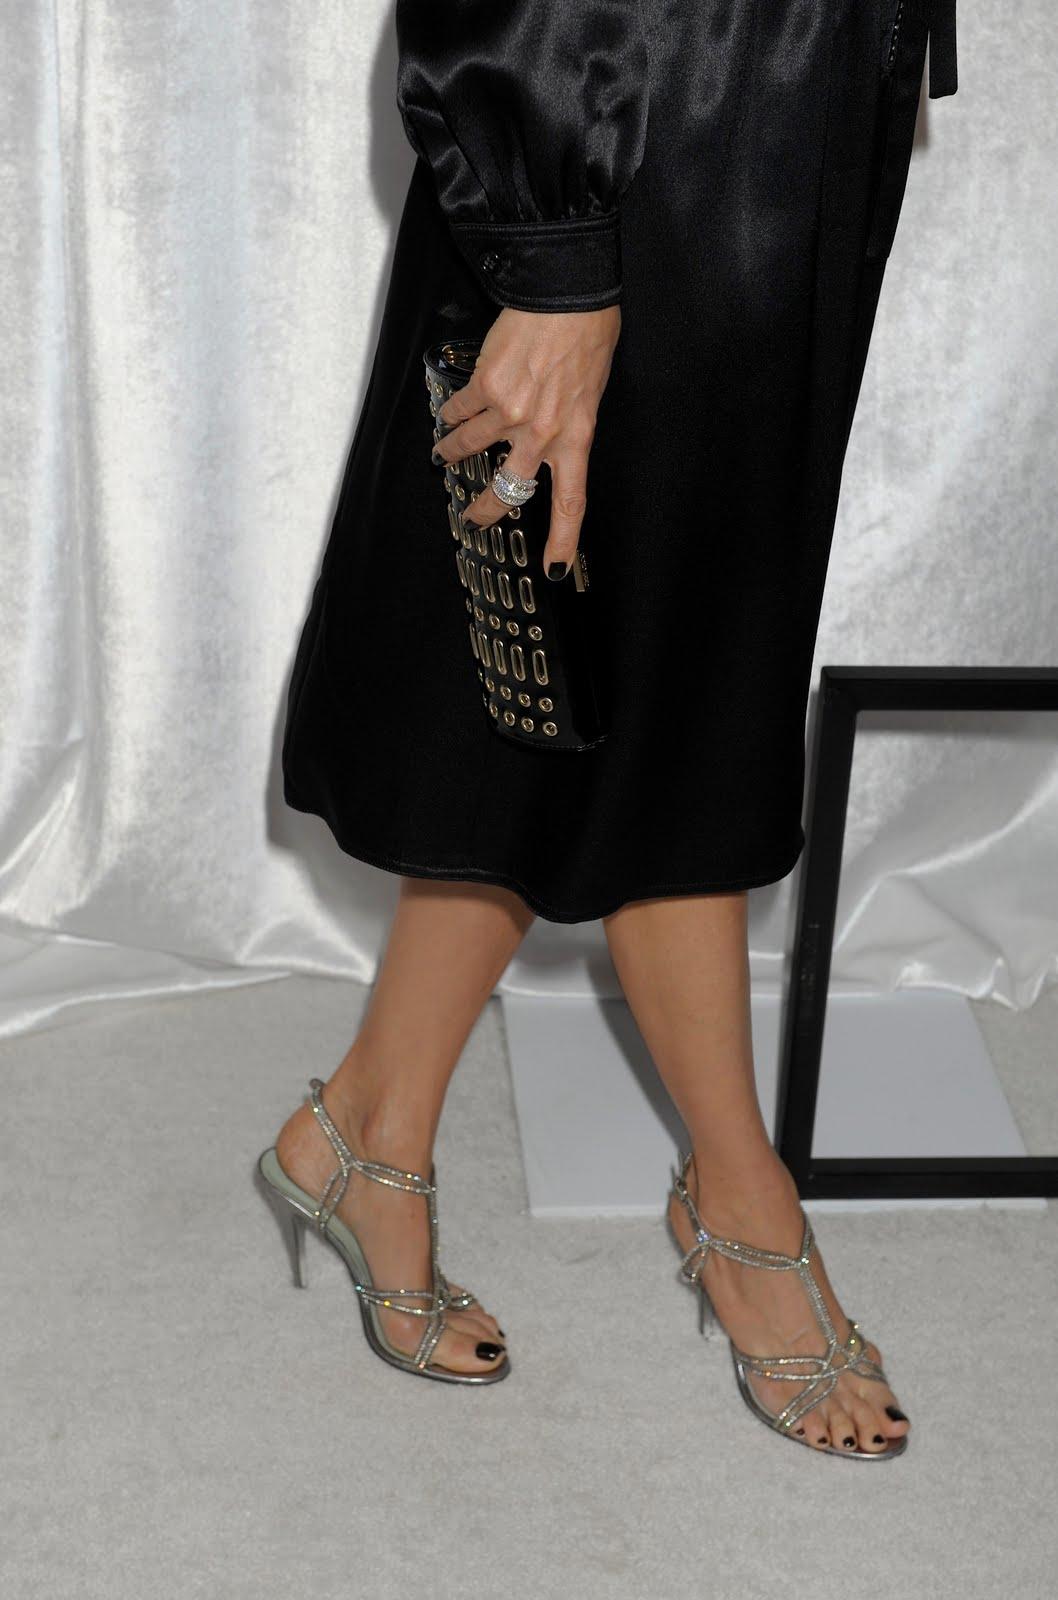 http://1.bp.blogspot.com/_UaLWp72nij4/S_bu1QxHoXI/AAAAAAAAMJk/BEDeNpp1eUg/s1600/lisa-edelstein-feet-4.jpg